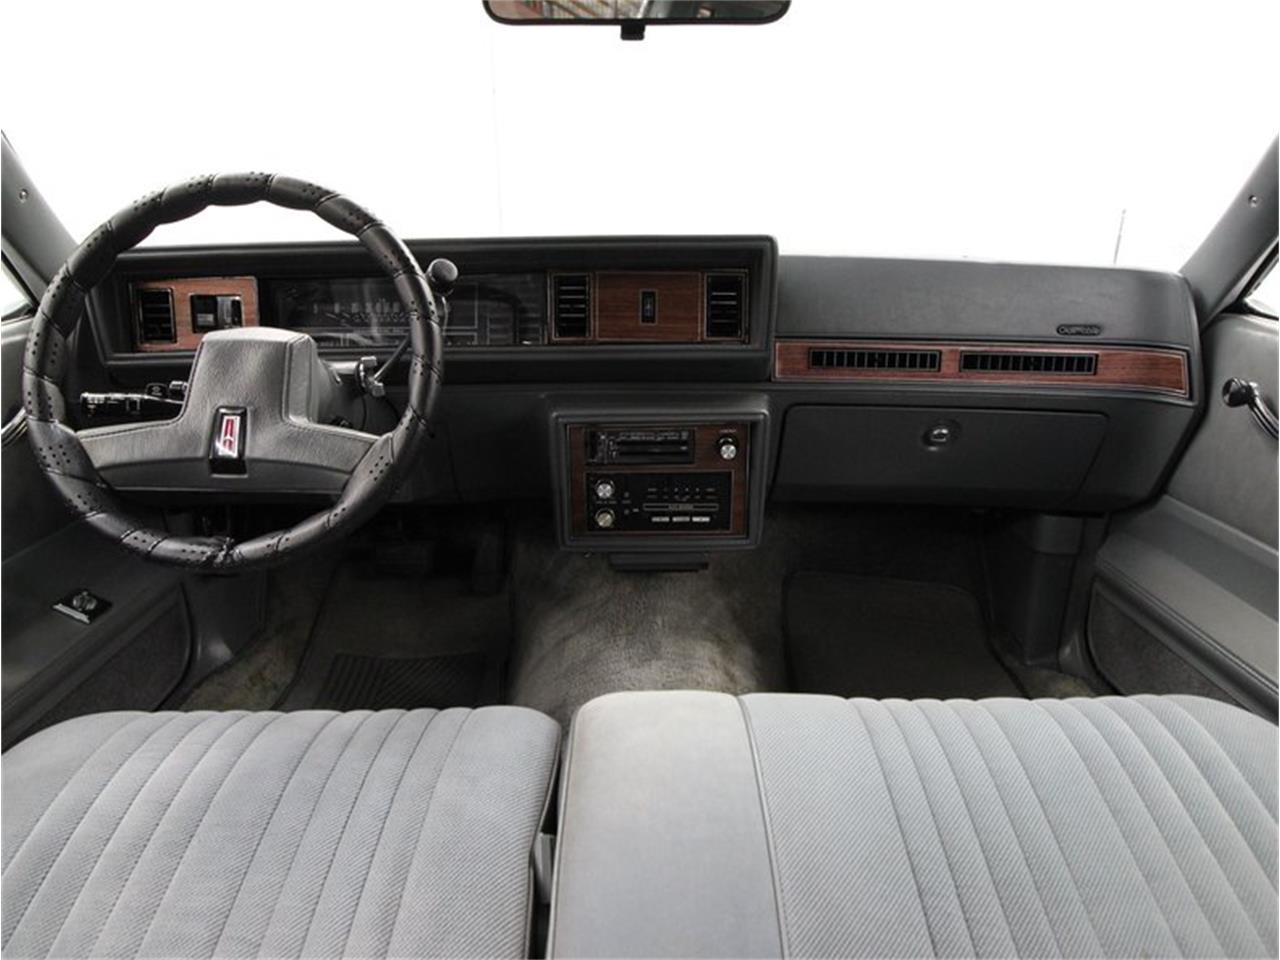 1986 Oldsmobile Cutlass (CC-1386321) for sale in Christiansburg, Virginia